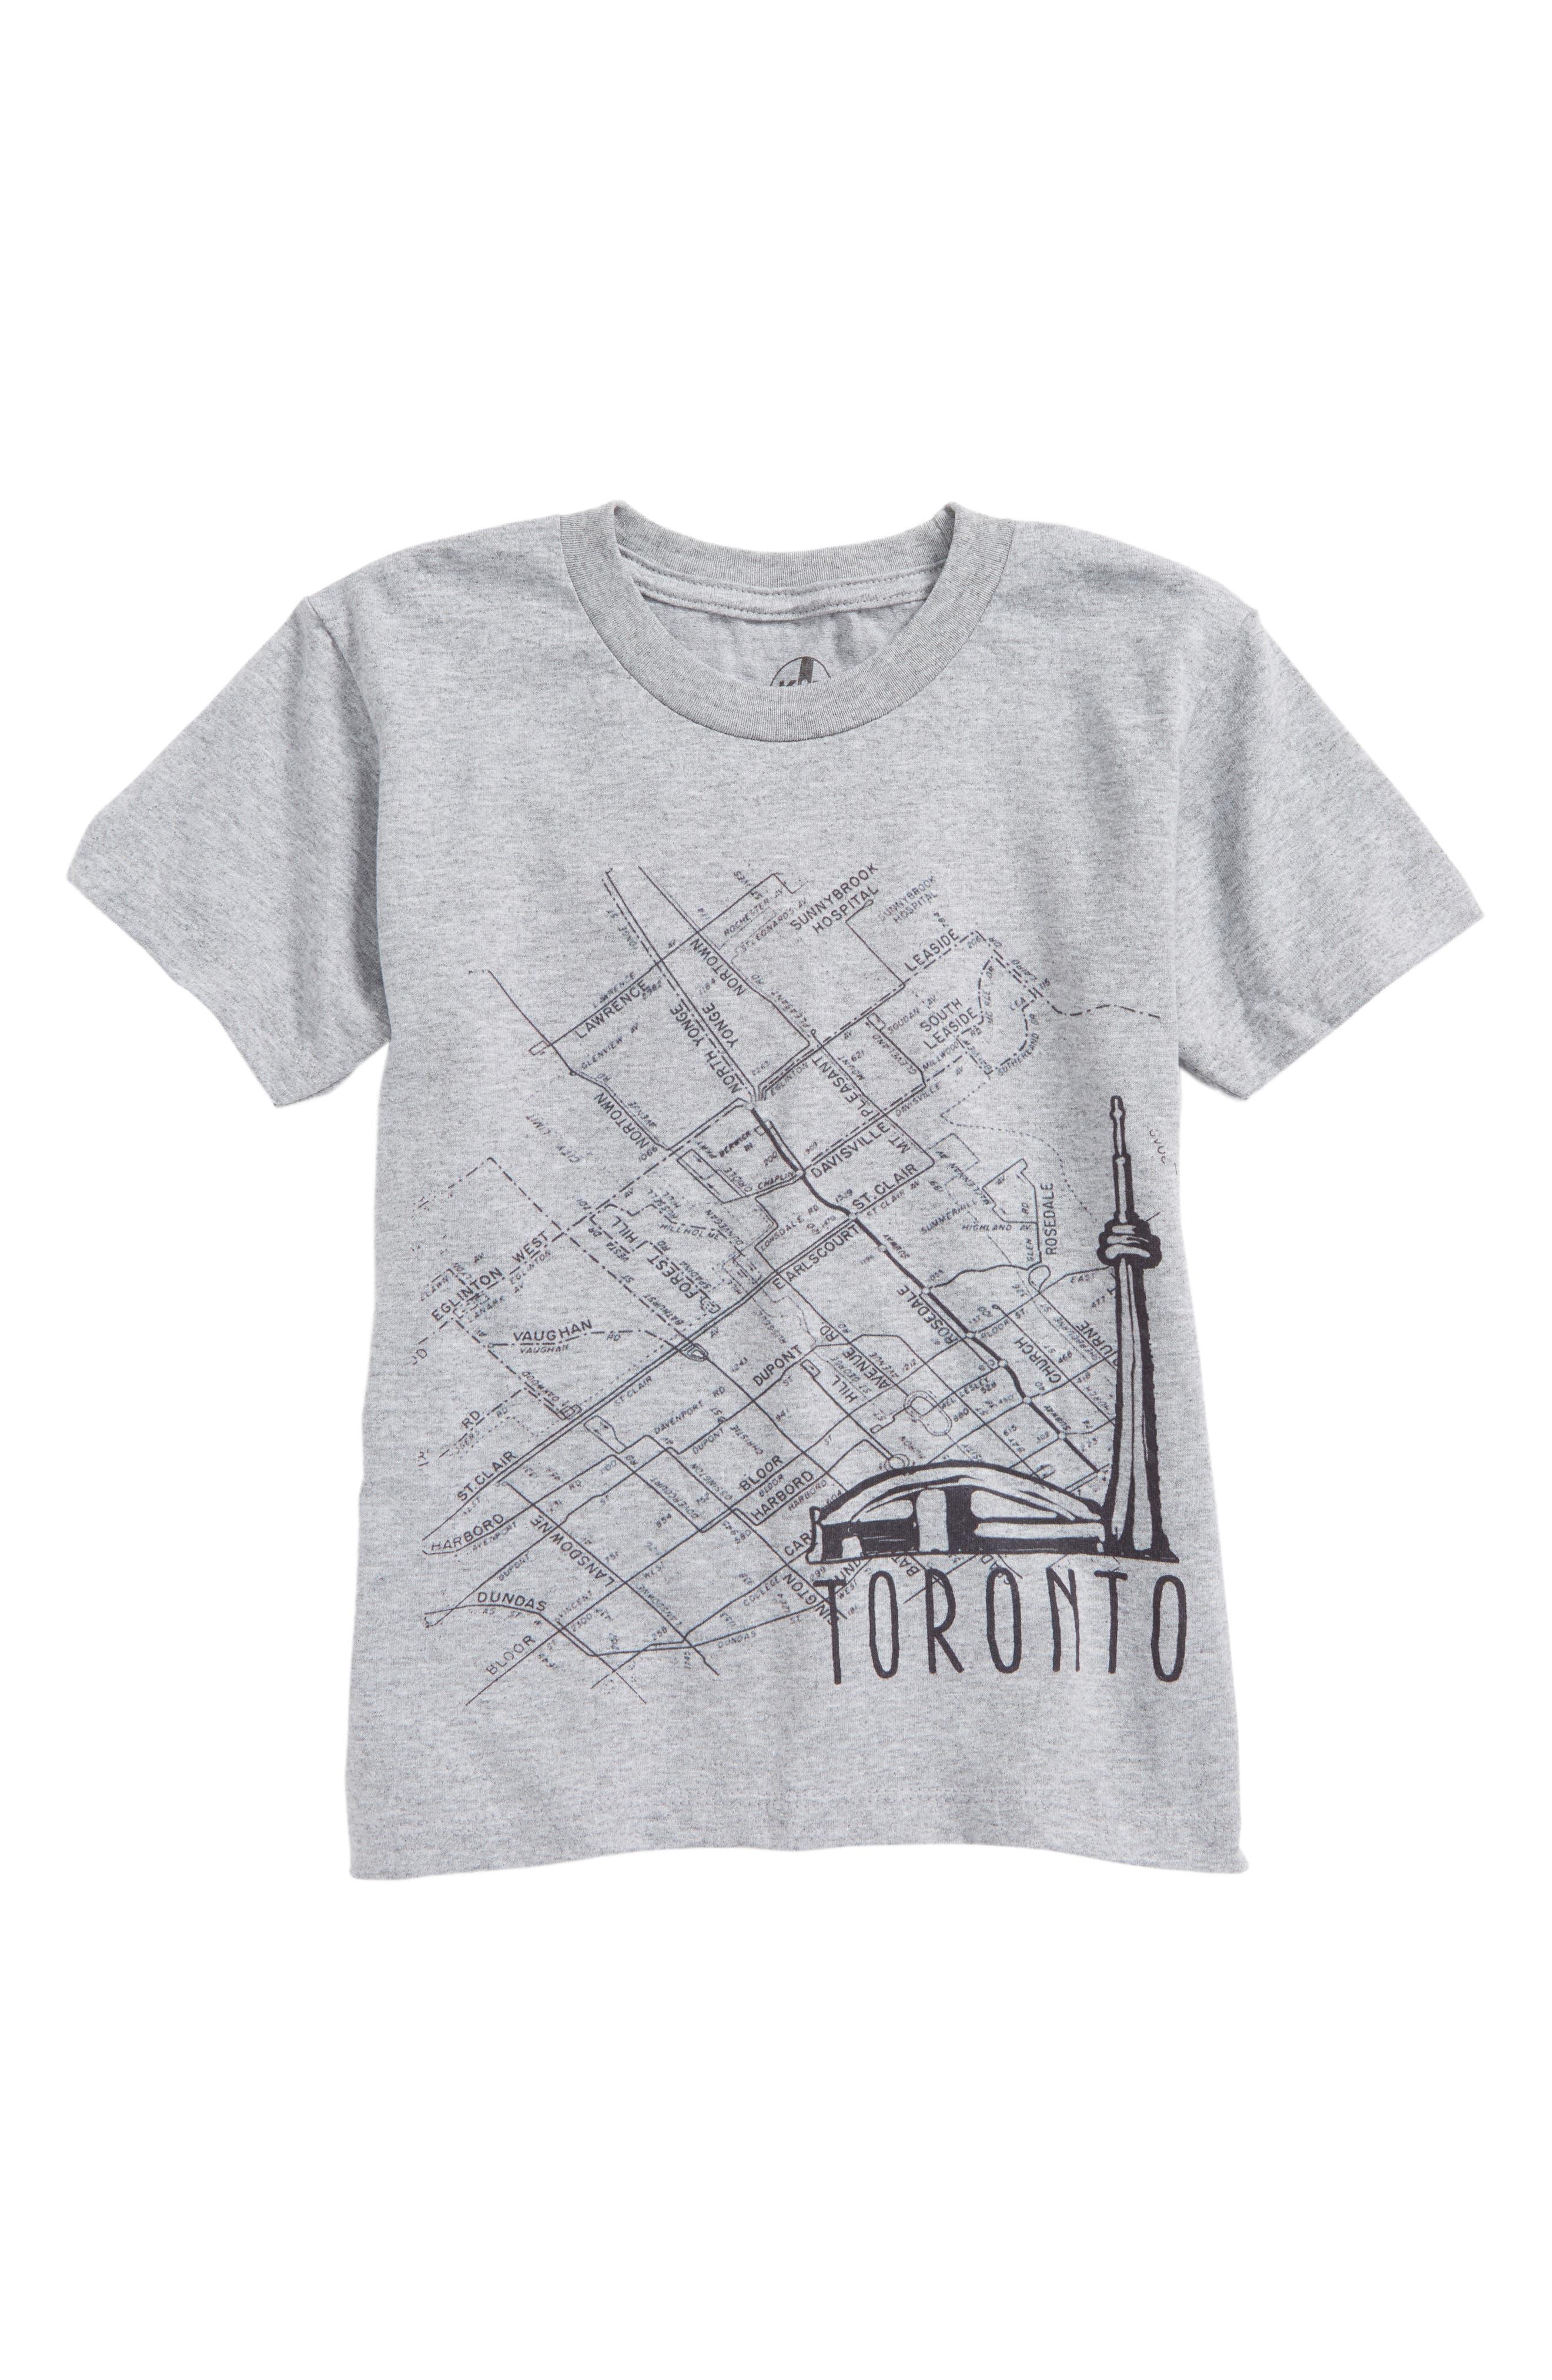 Main Image - Kid Dangerous Toronto Map Graphic T-Shirt (Toddler Boys & Little Boys)